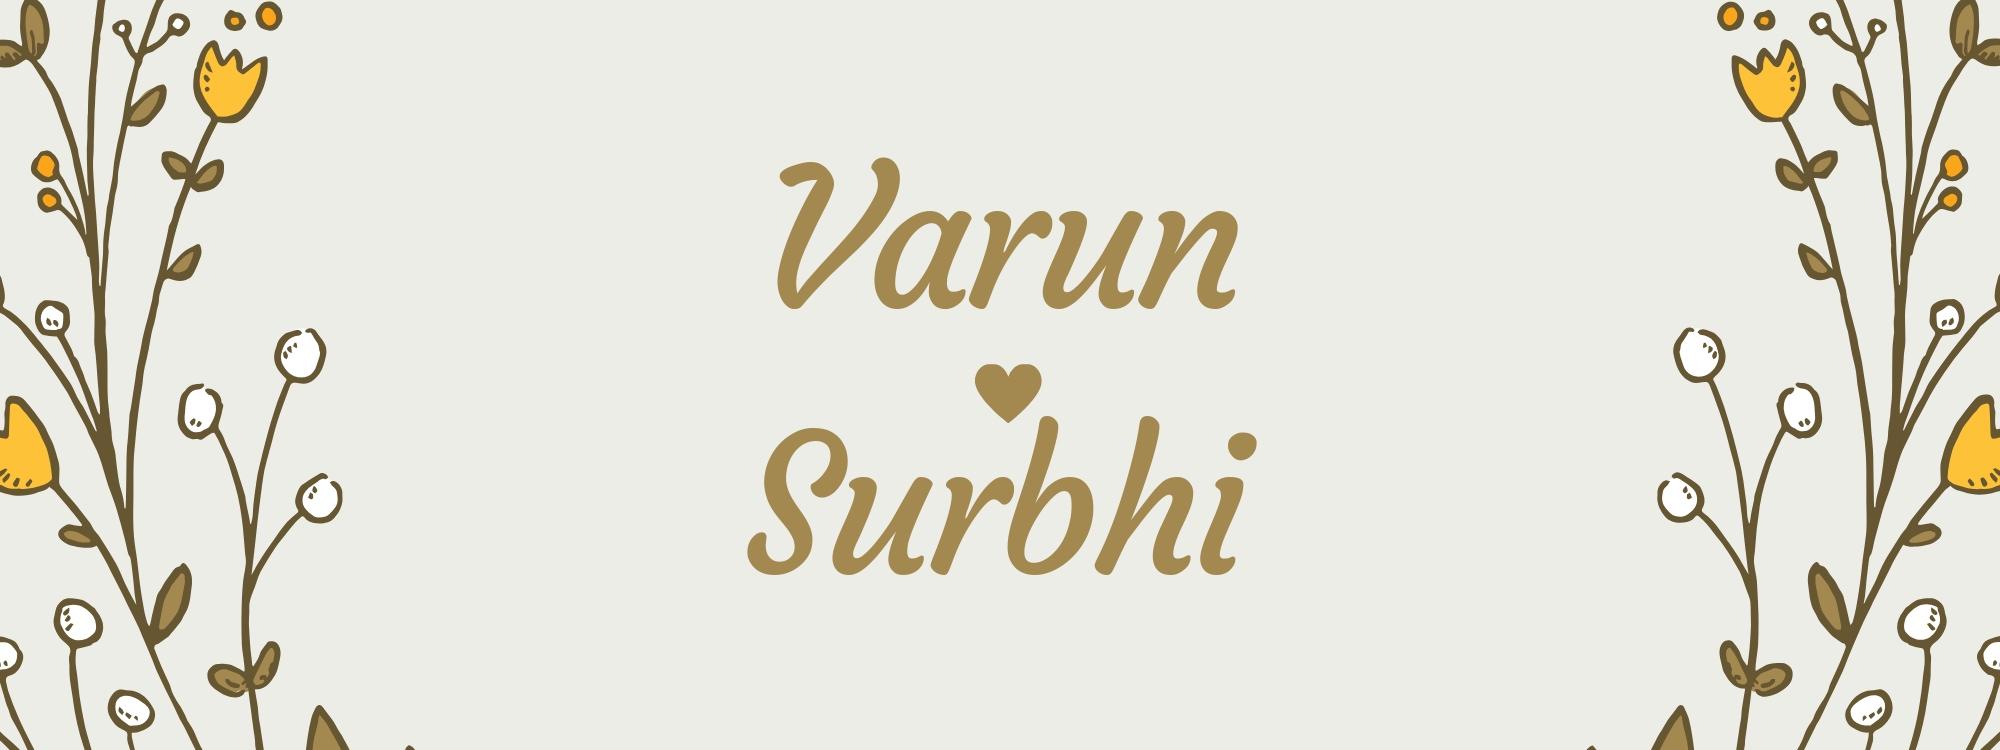 Varun&Surbhi